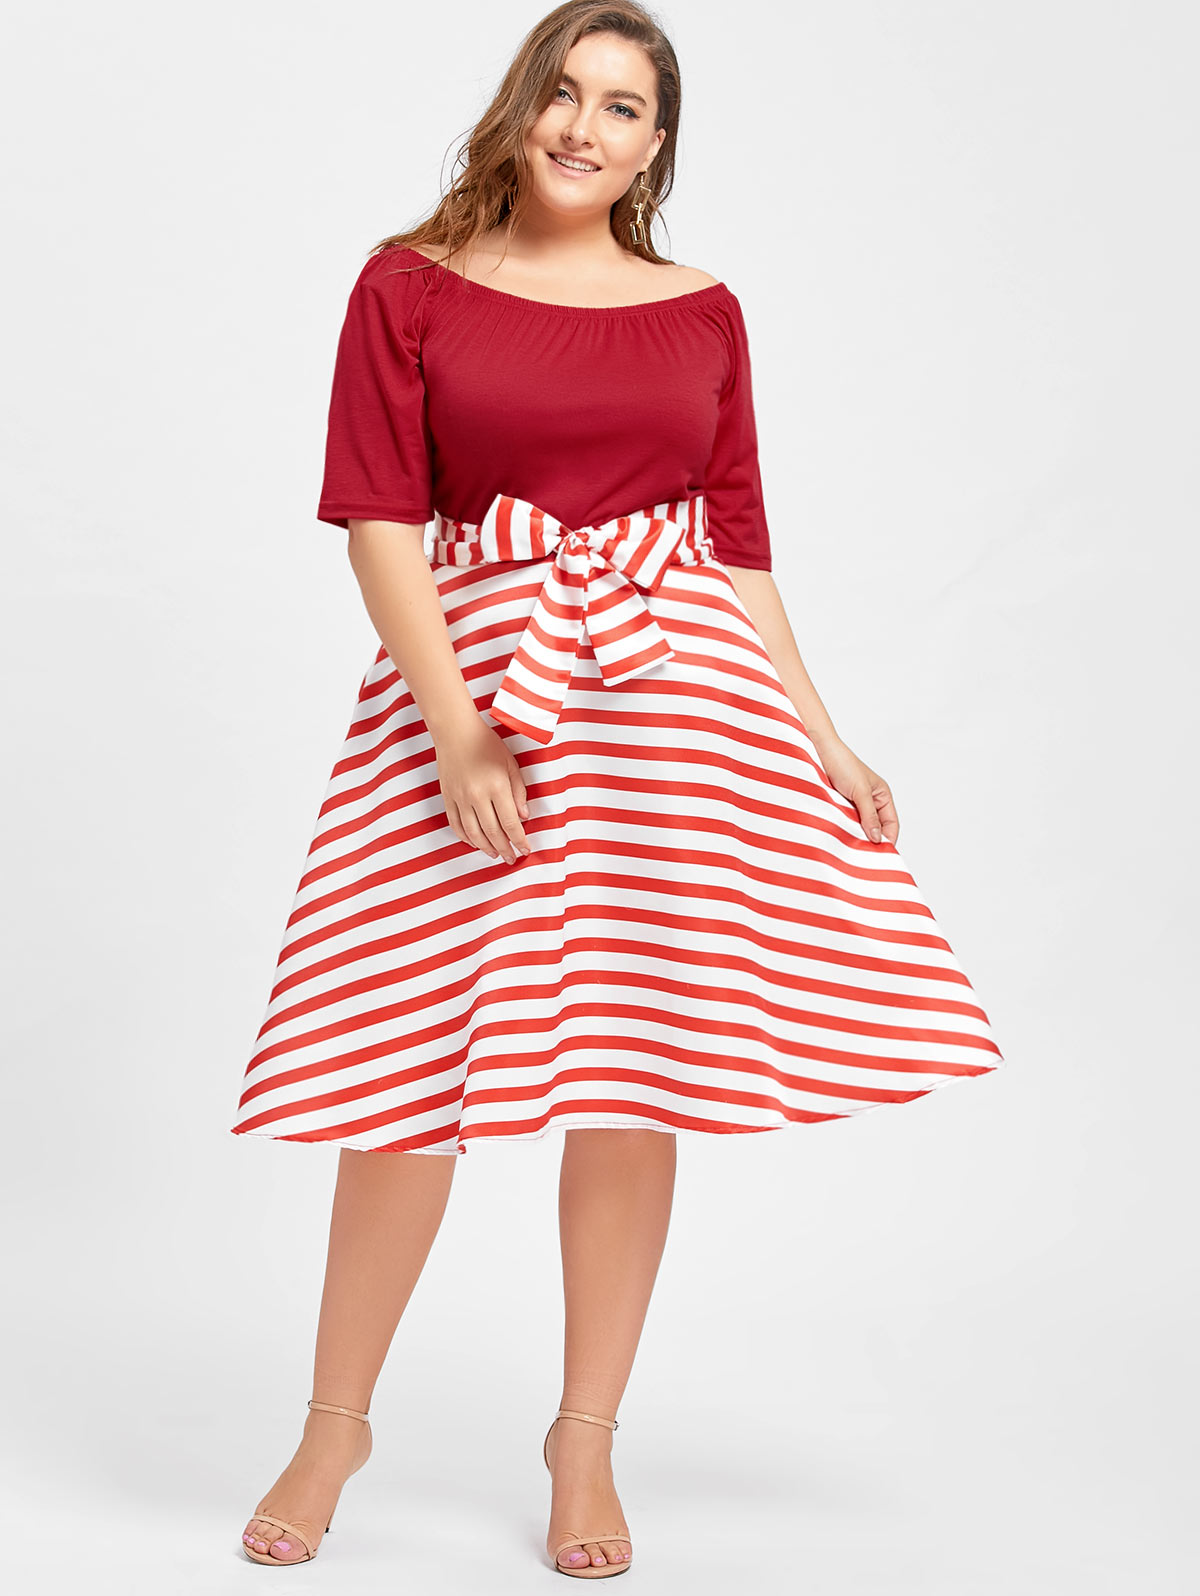 Kenancy Women Retro Dresses Plus Size Stripe Christmas